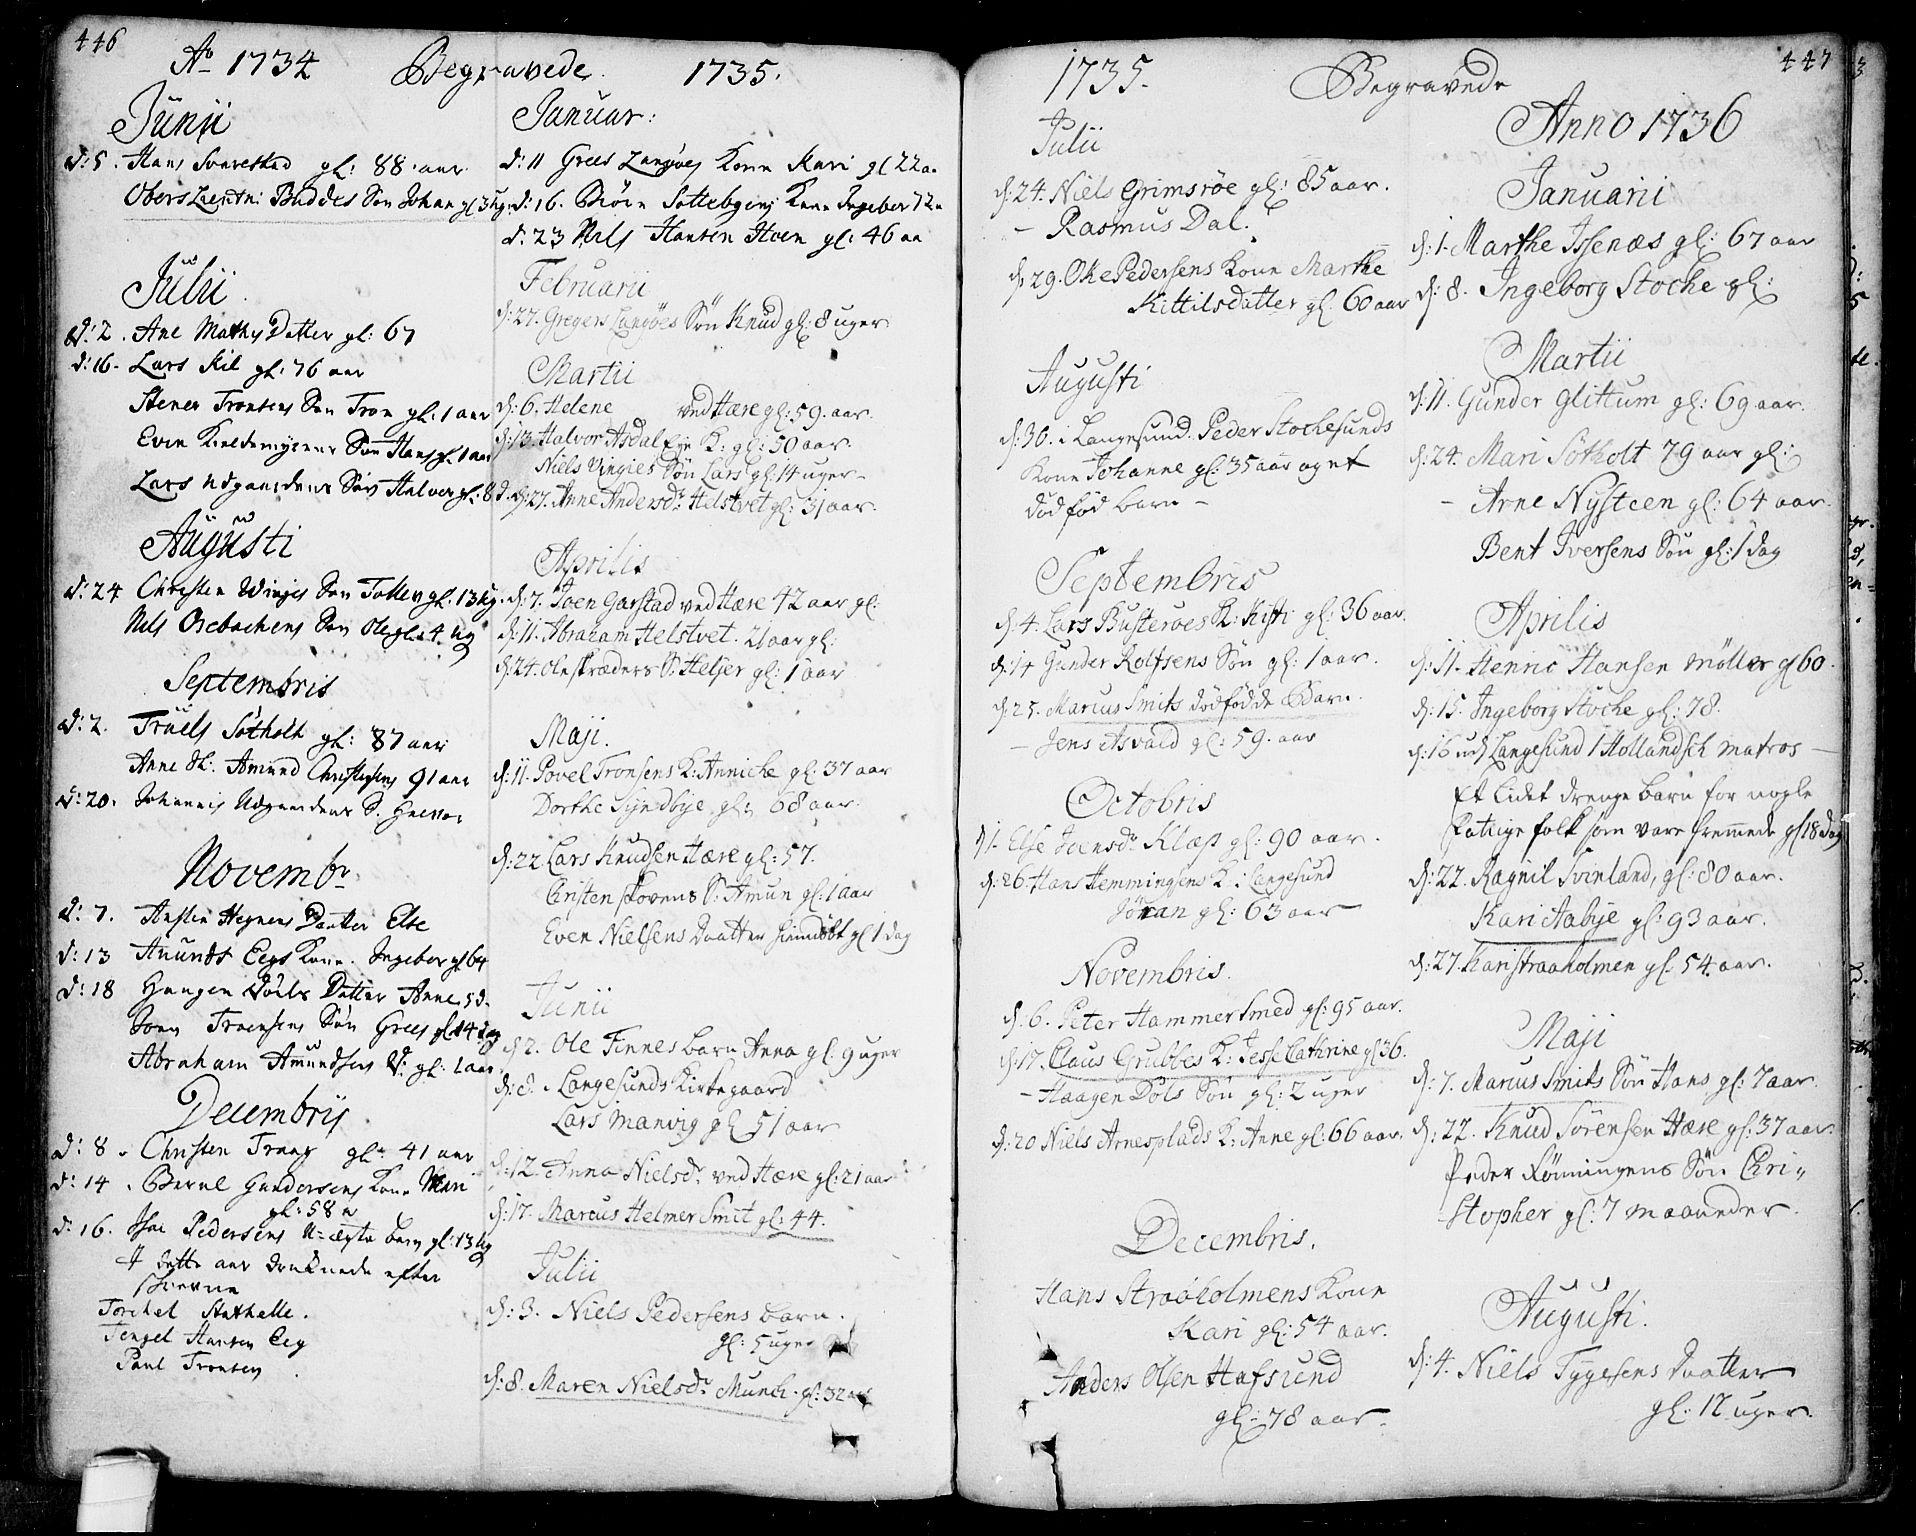 SAKO, Bamble kirkebøker, F/Fa/L0001: Ministerialbok nr. I 1, 1702-1774, s. 446-447